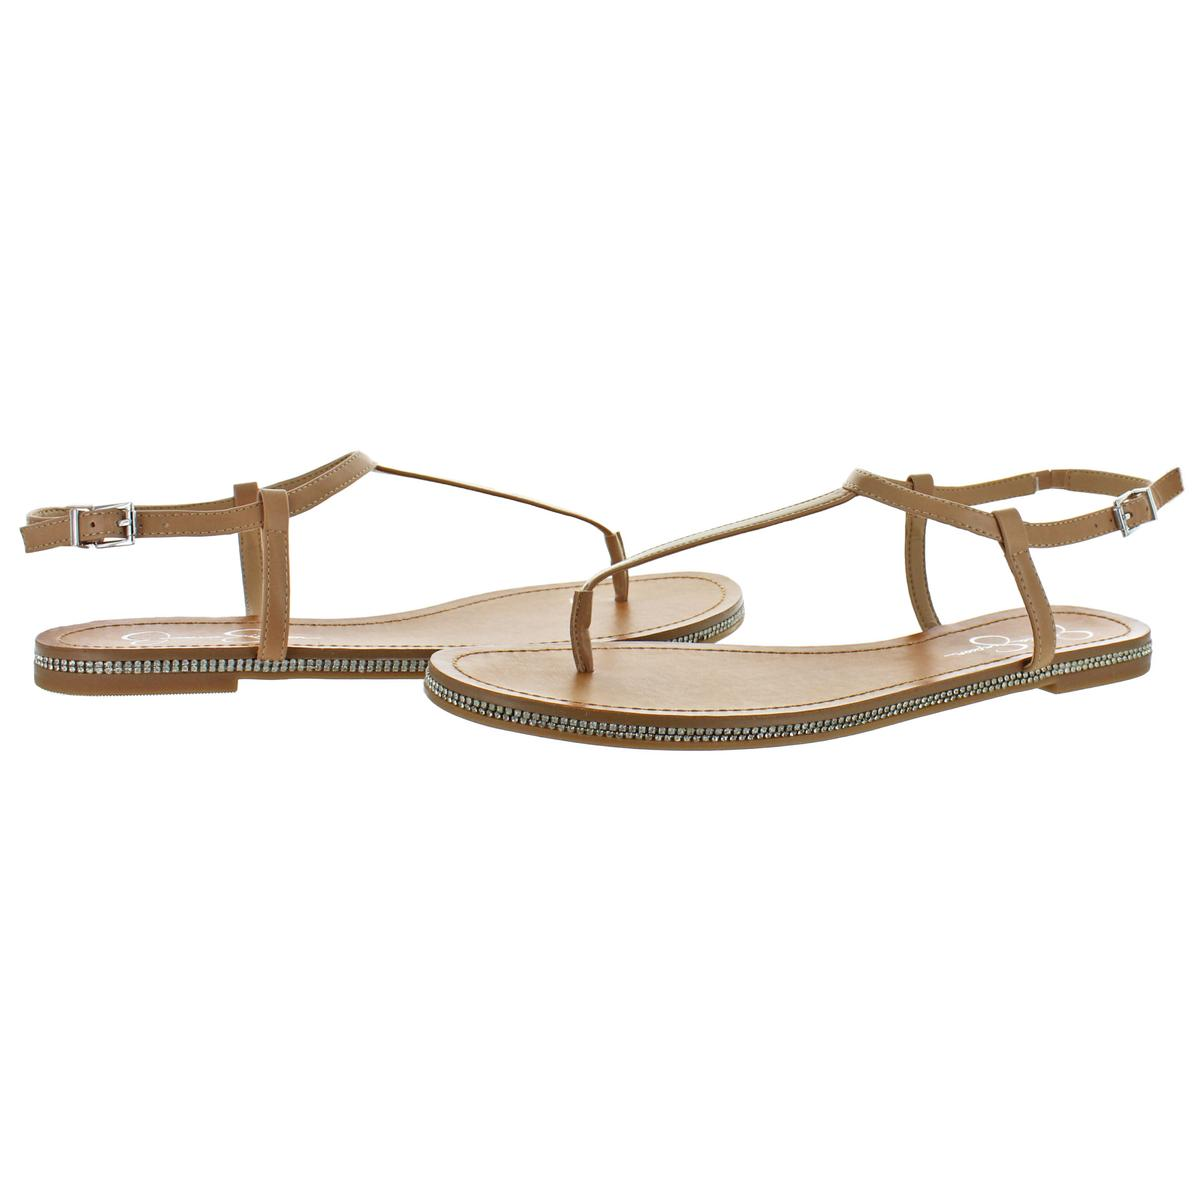 Jessica-Simpson-Femme-Brimah-Casual-String-Spartiates-Chaussures-BHFO-1194 miniature 7